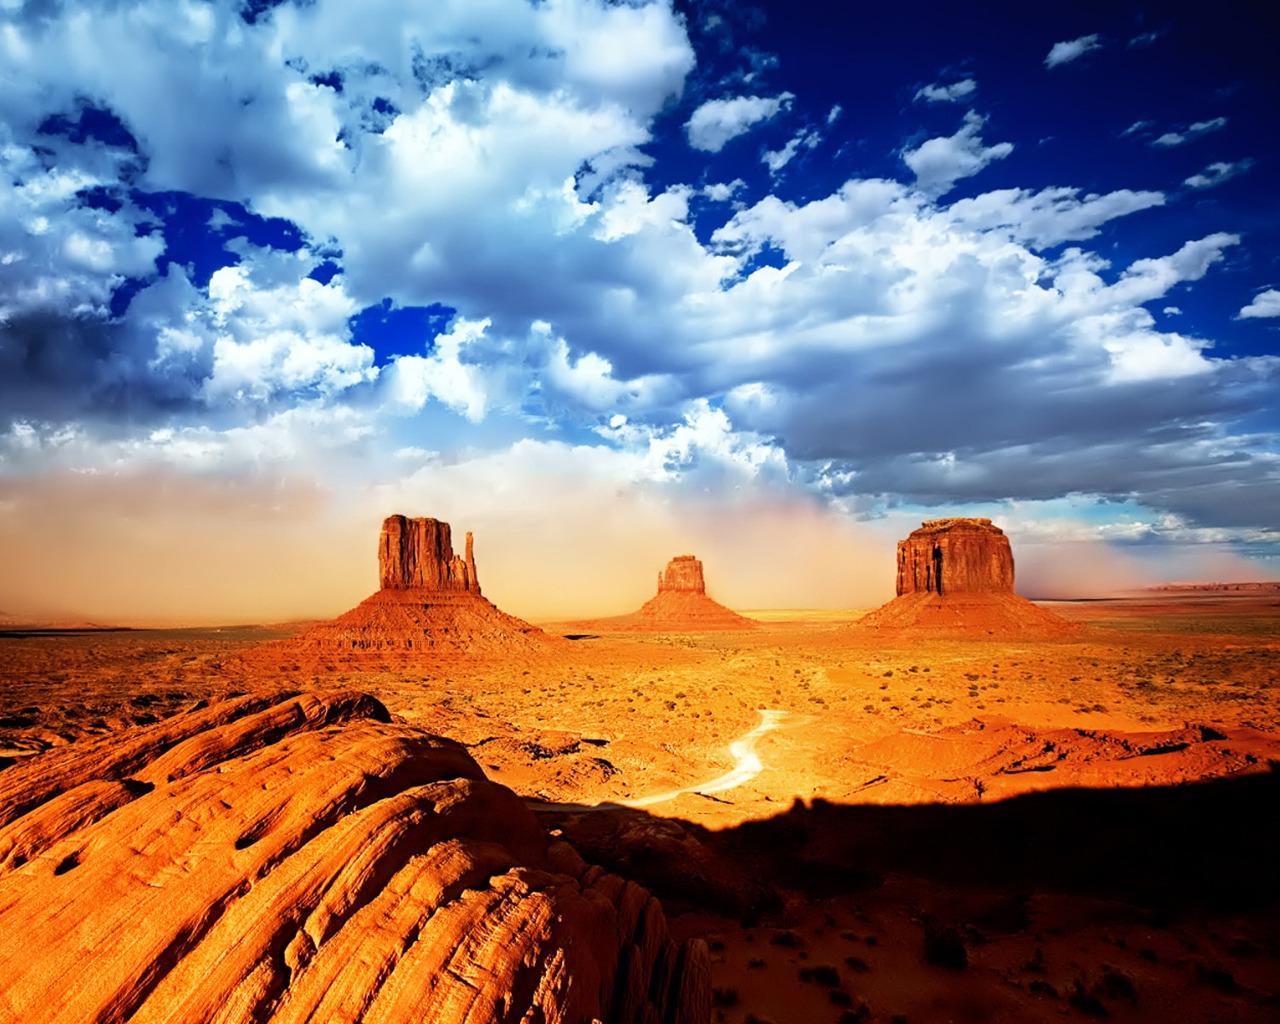 Arizona S Sonora Desert Wallpaper PicsWallpapercom 1280x1024